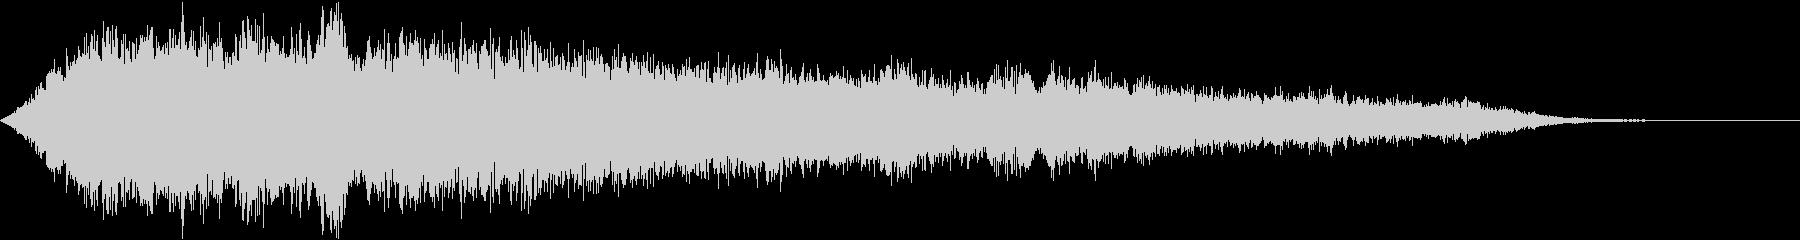 CINEMATIC RISER_05の未再生の波形